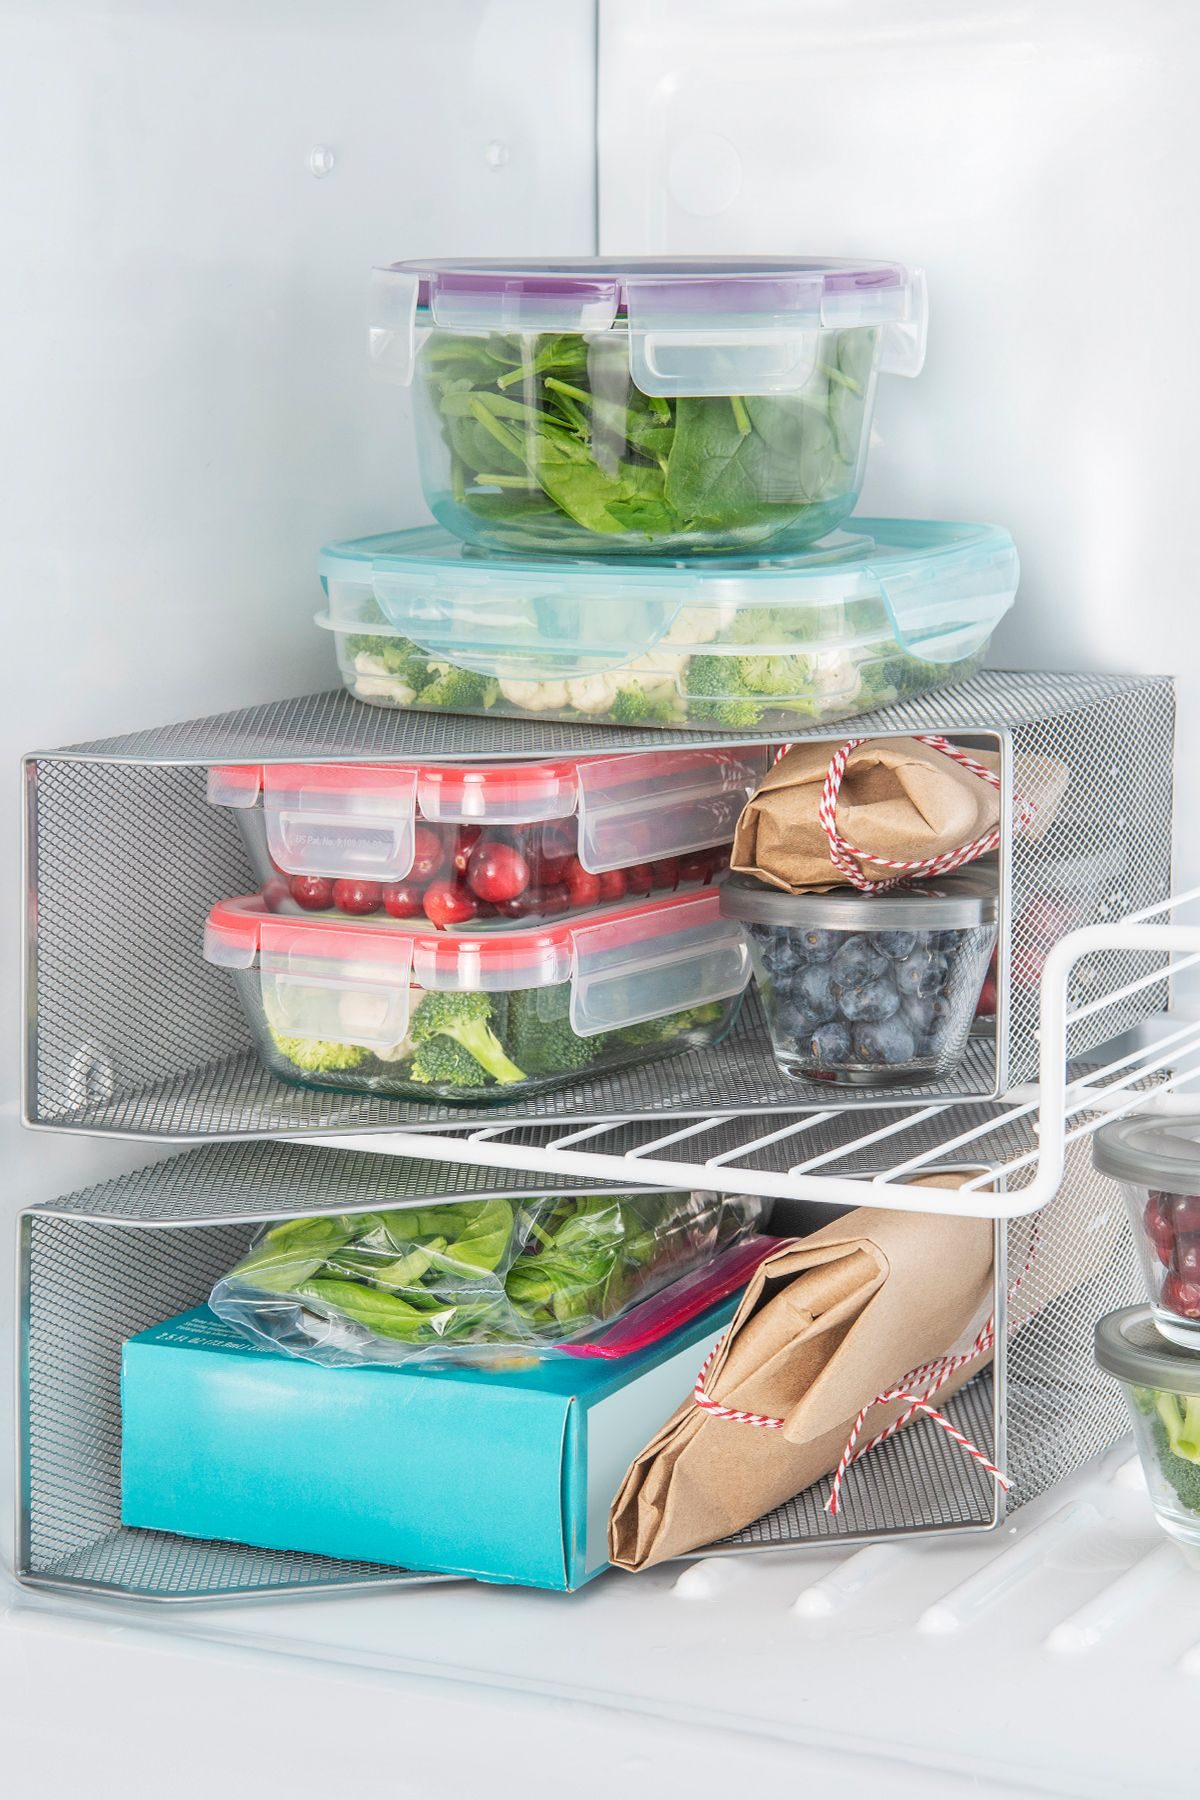 Stupendous Add Instant Shelves To Your Freezer Fridge Hacks In 2019 Interior Design Ideas Gentotryabchikinfo